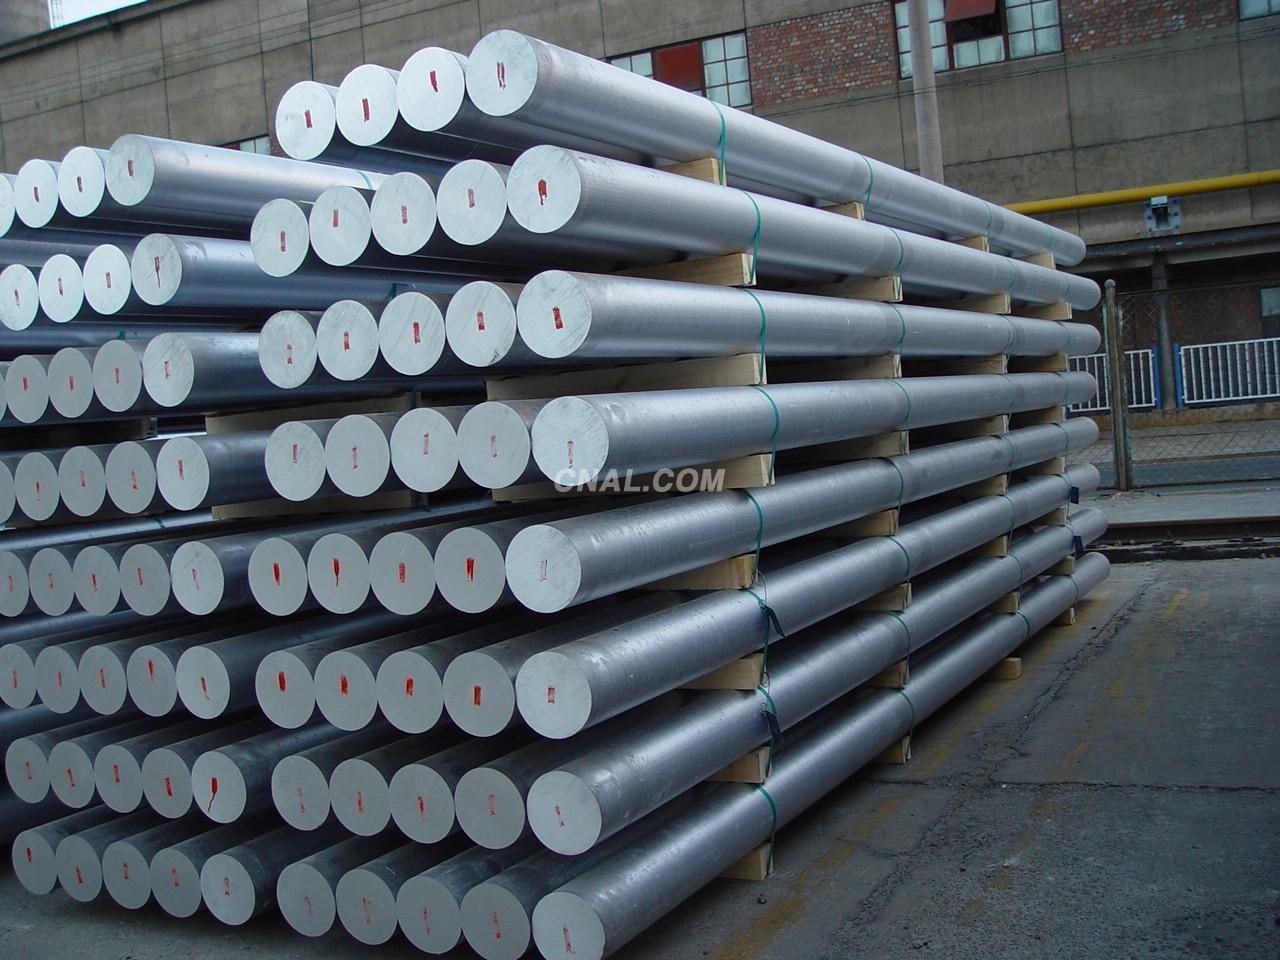 5A055052 antirust aluminum plate LY12CZ aluminum rod 608260617075 hard aluminum T4T5T6 heat treatment